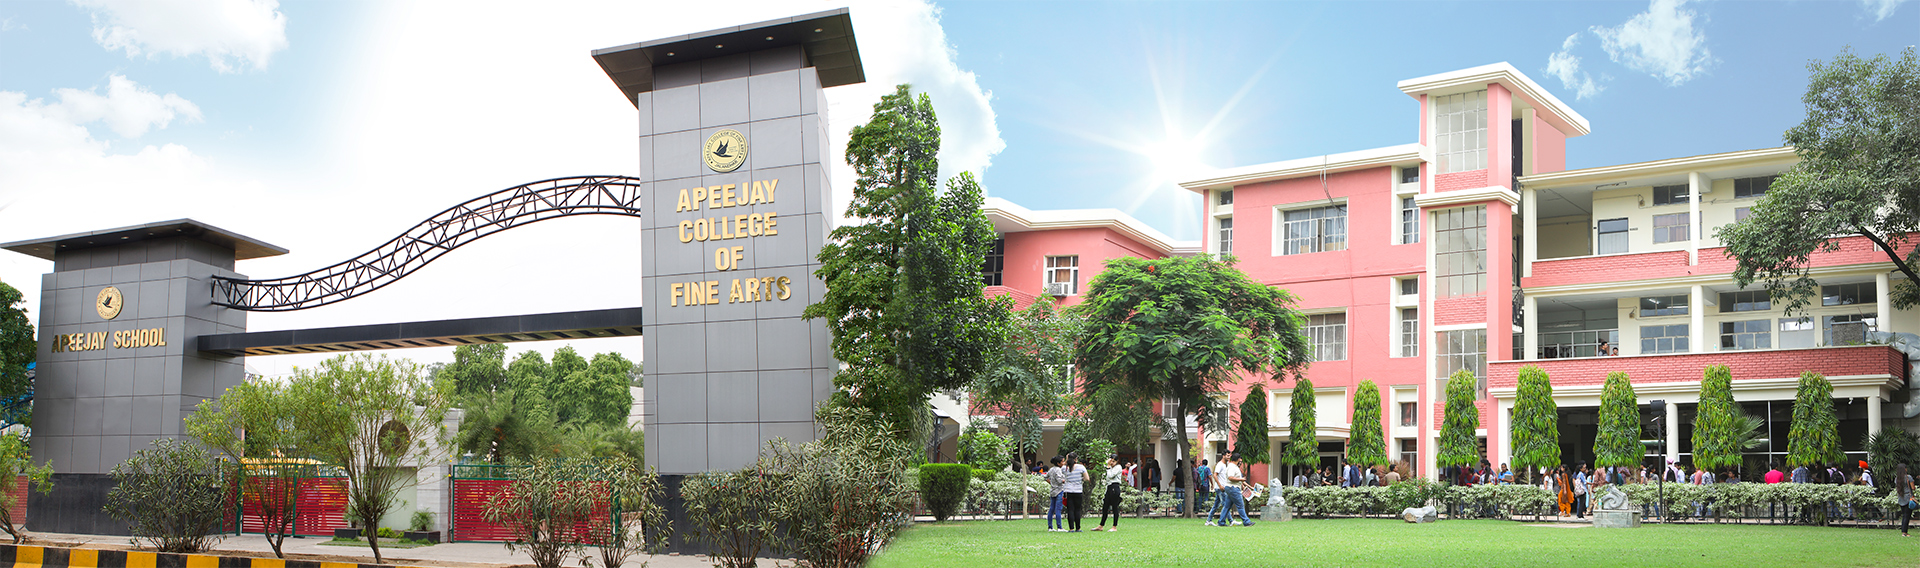 Apeejay College of Fine Arts, Jalandhar Image